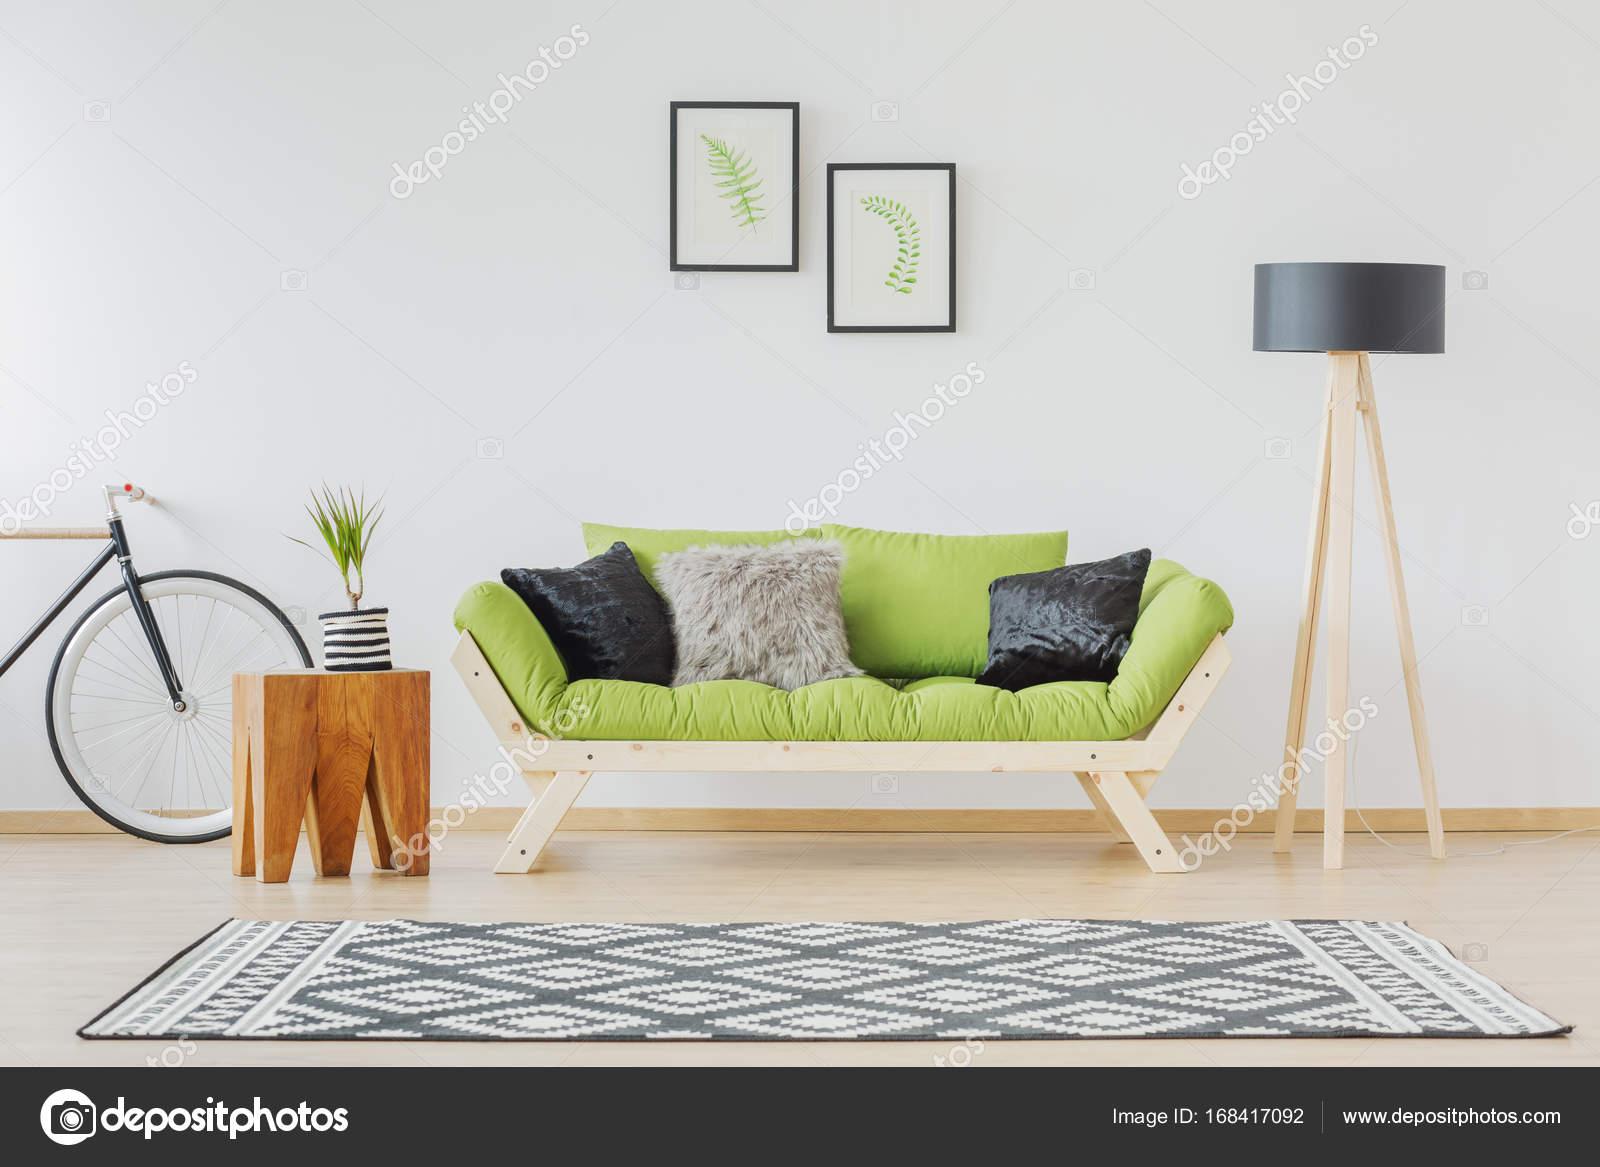 Grunes Sofa Und Schwarzem Akzent Stockfoto C Photographee Eu